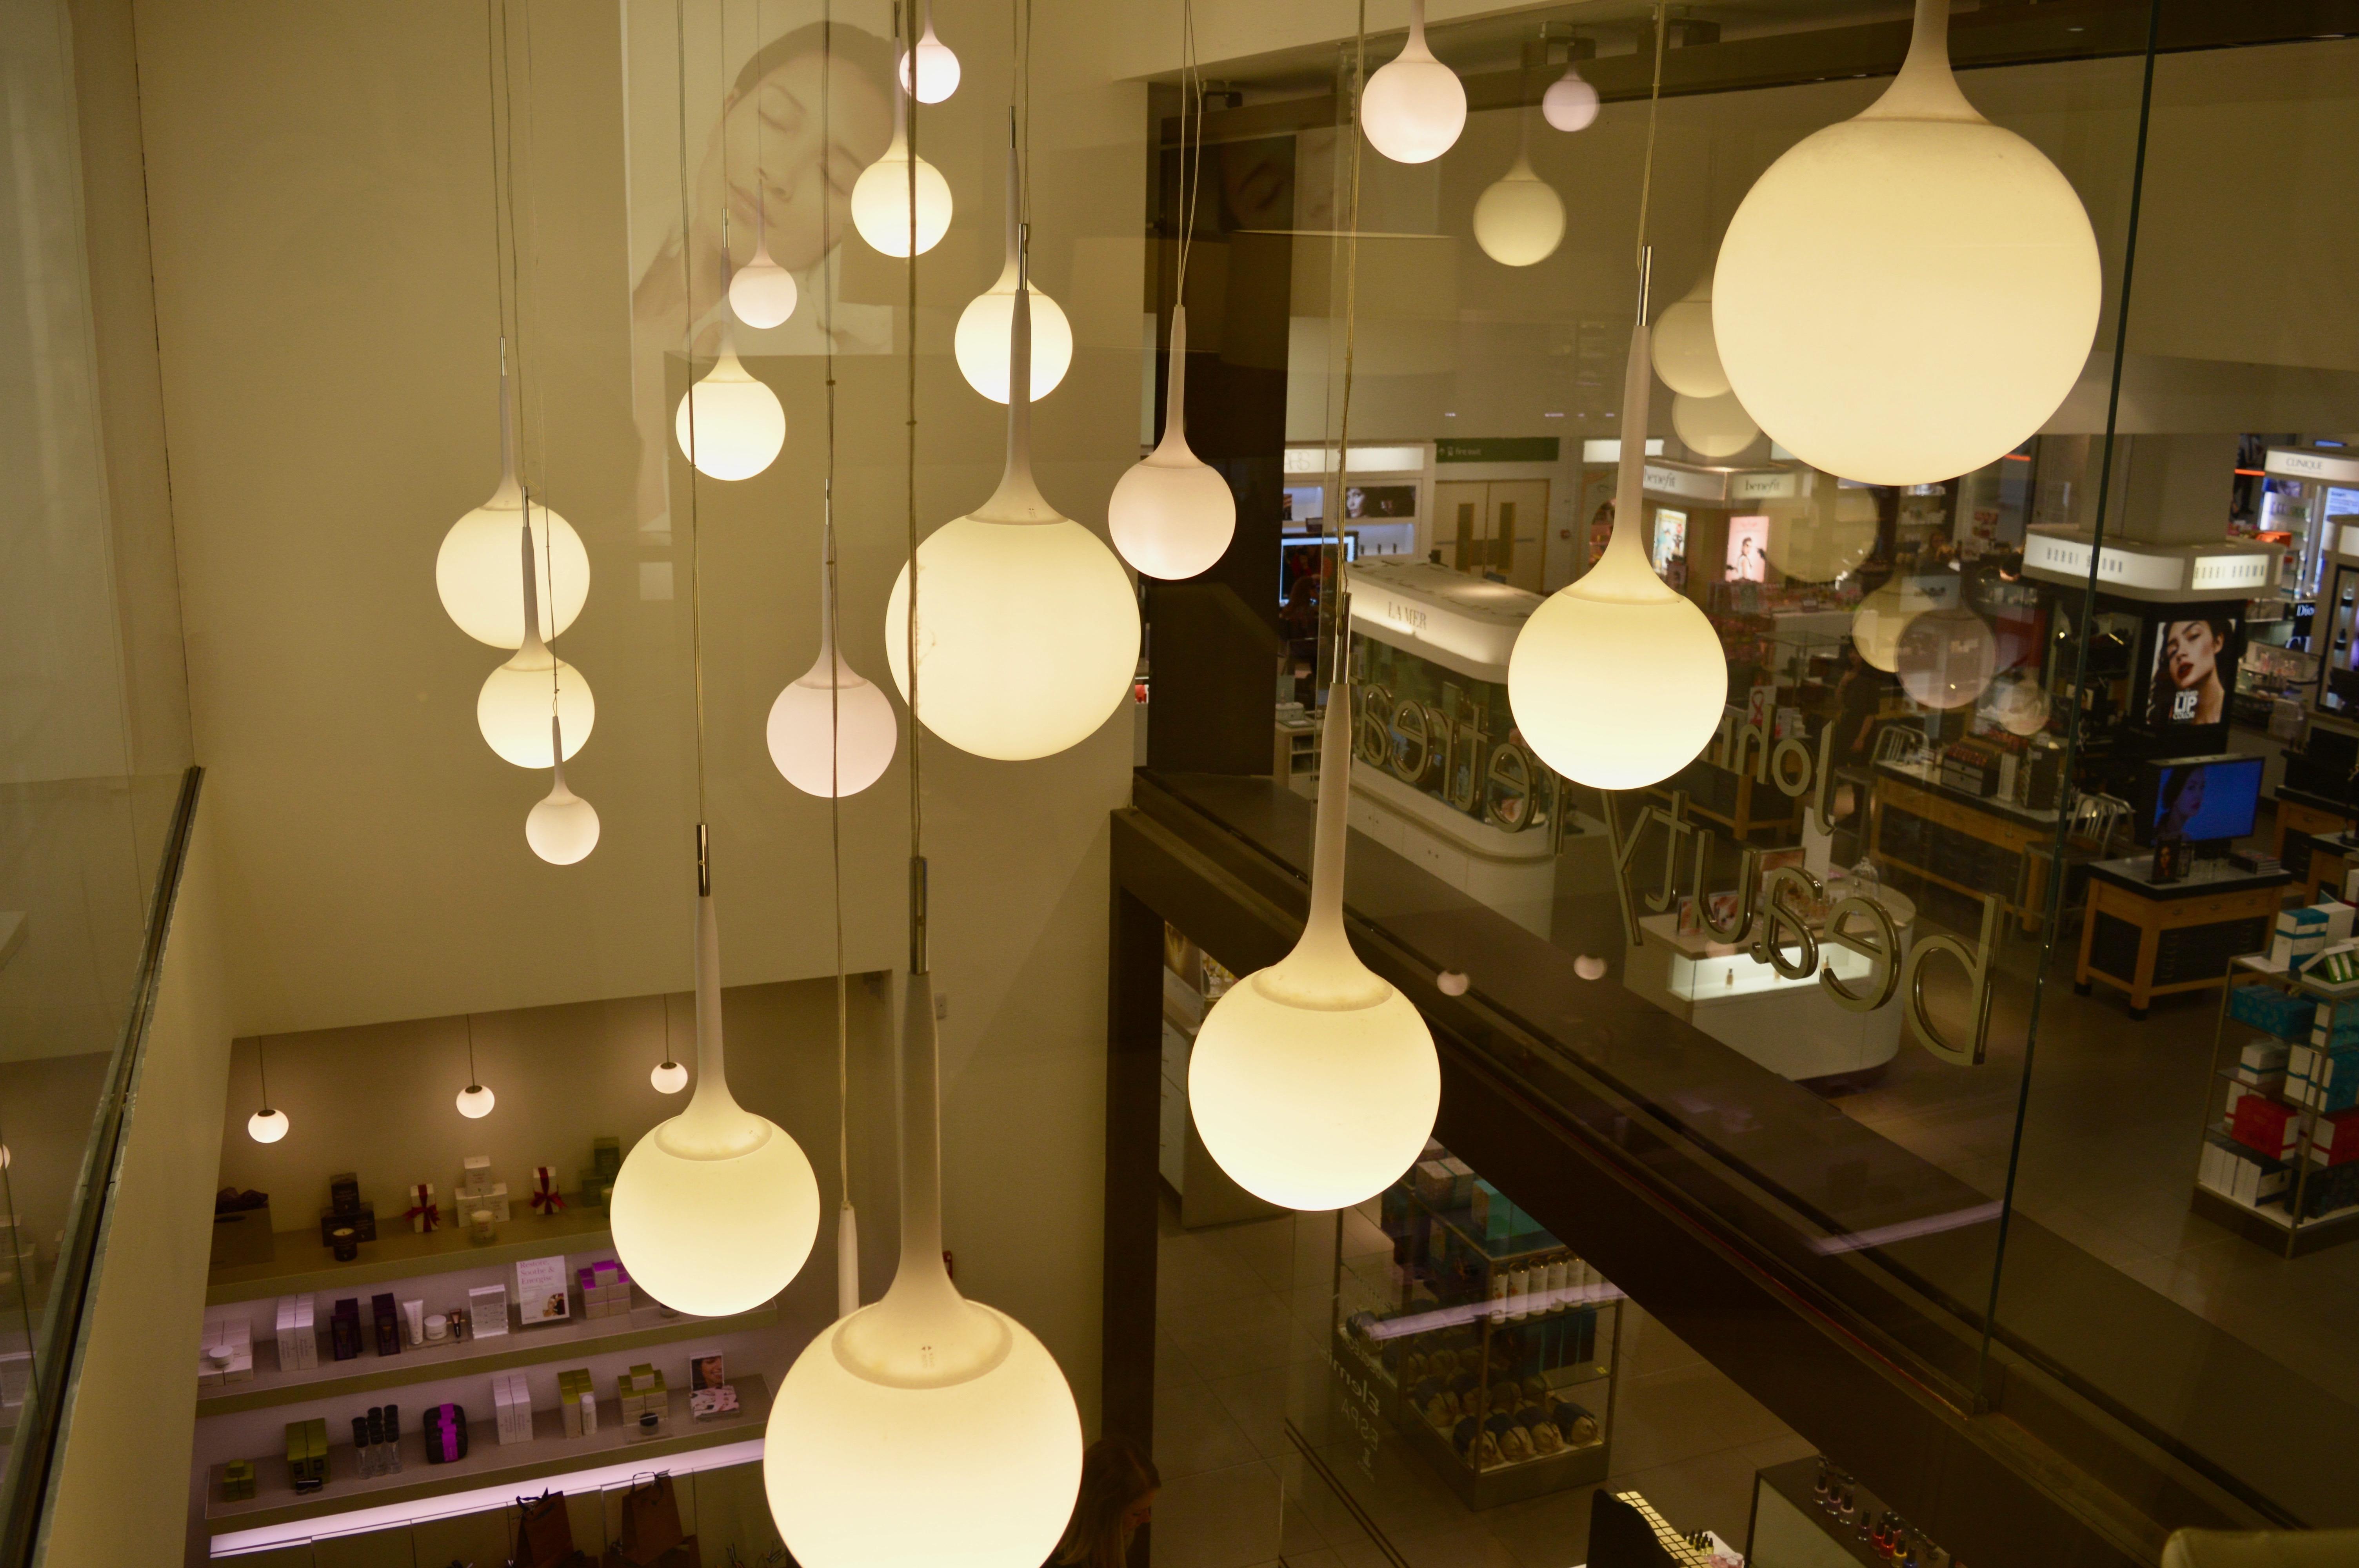 lights-john-lewis-newcastle-beauty-retreat-north-east-blogging-event-elle-blonde-luxury-lifestyle-destination-blog